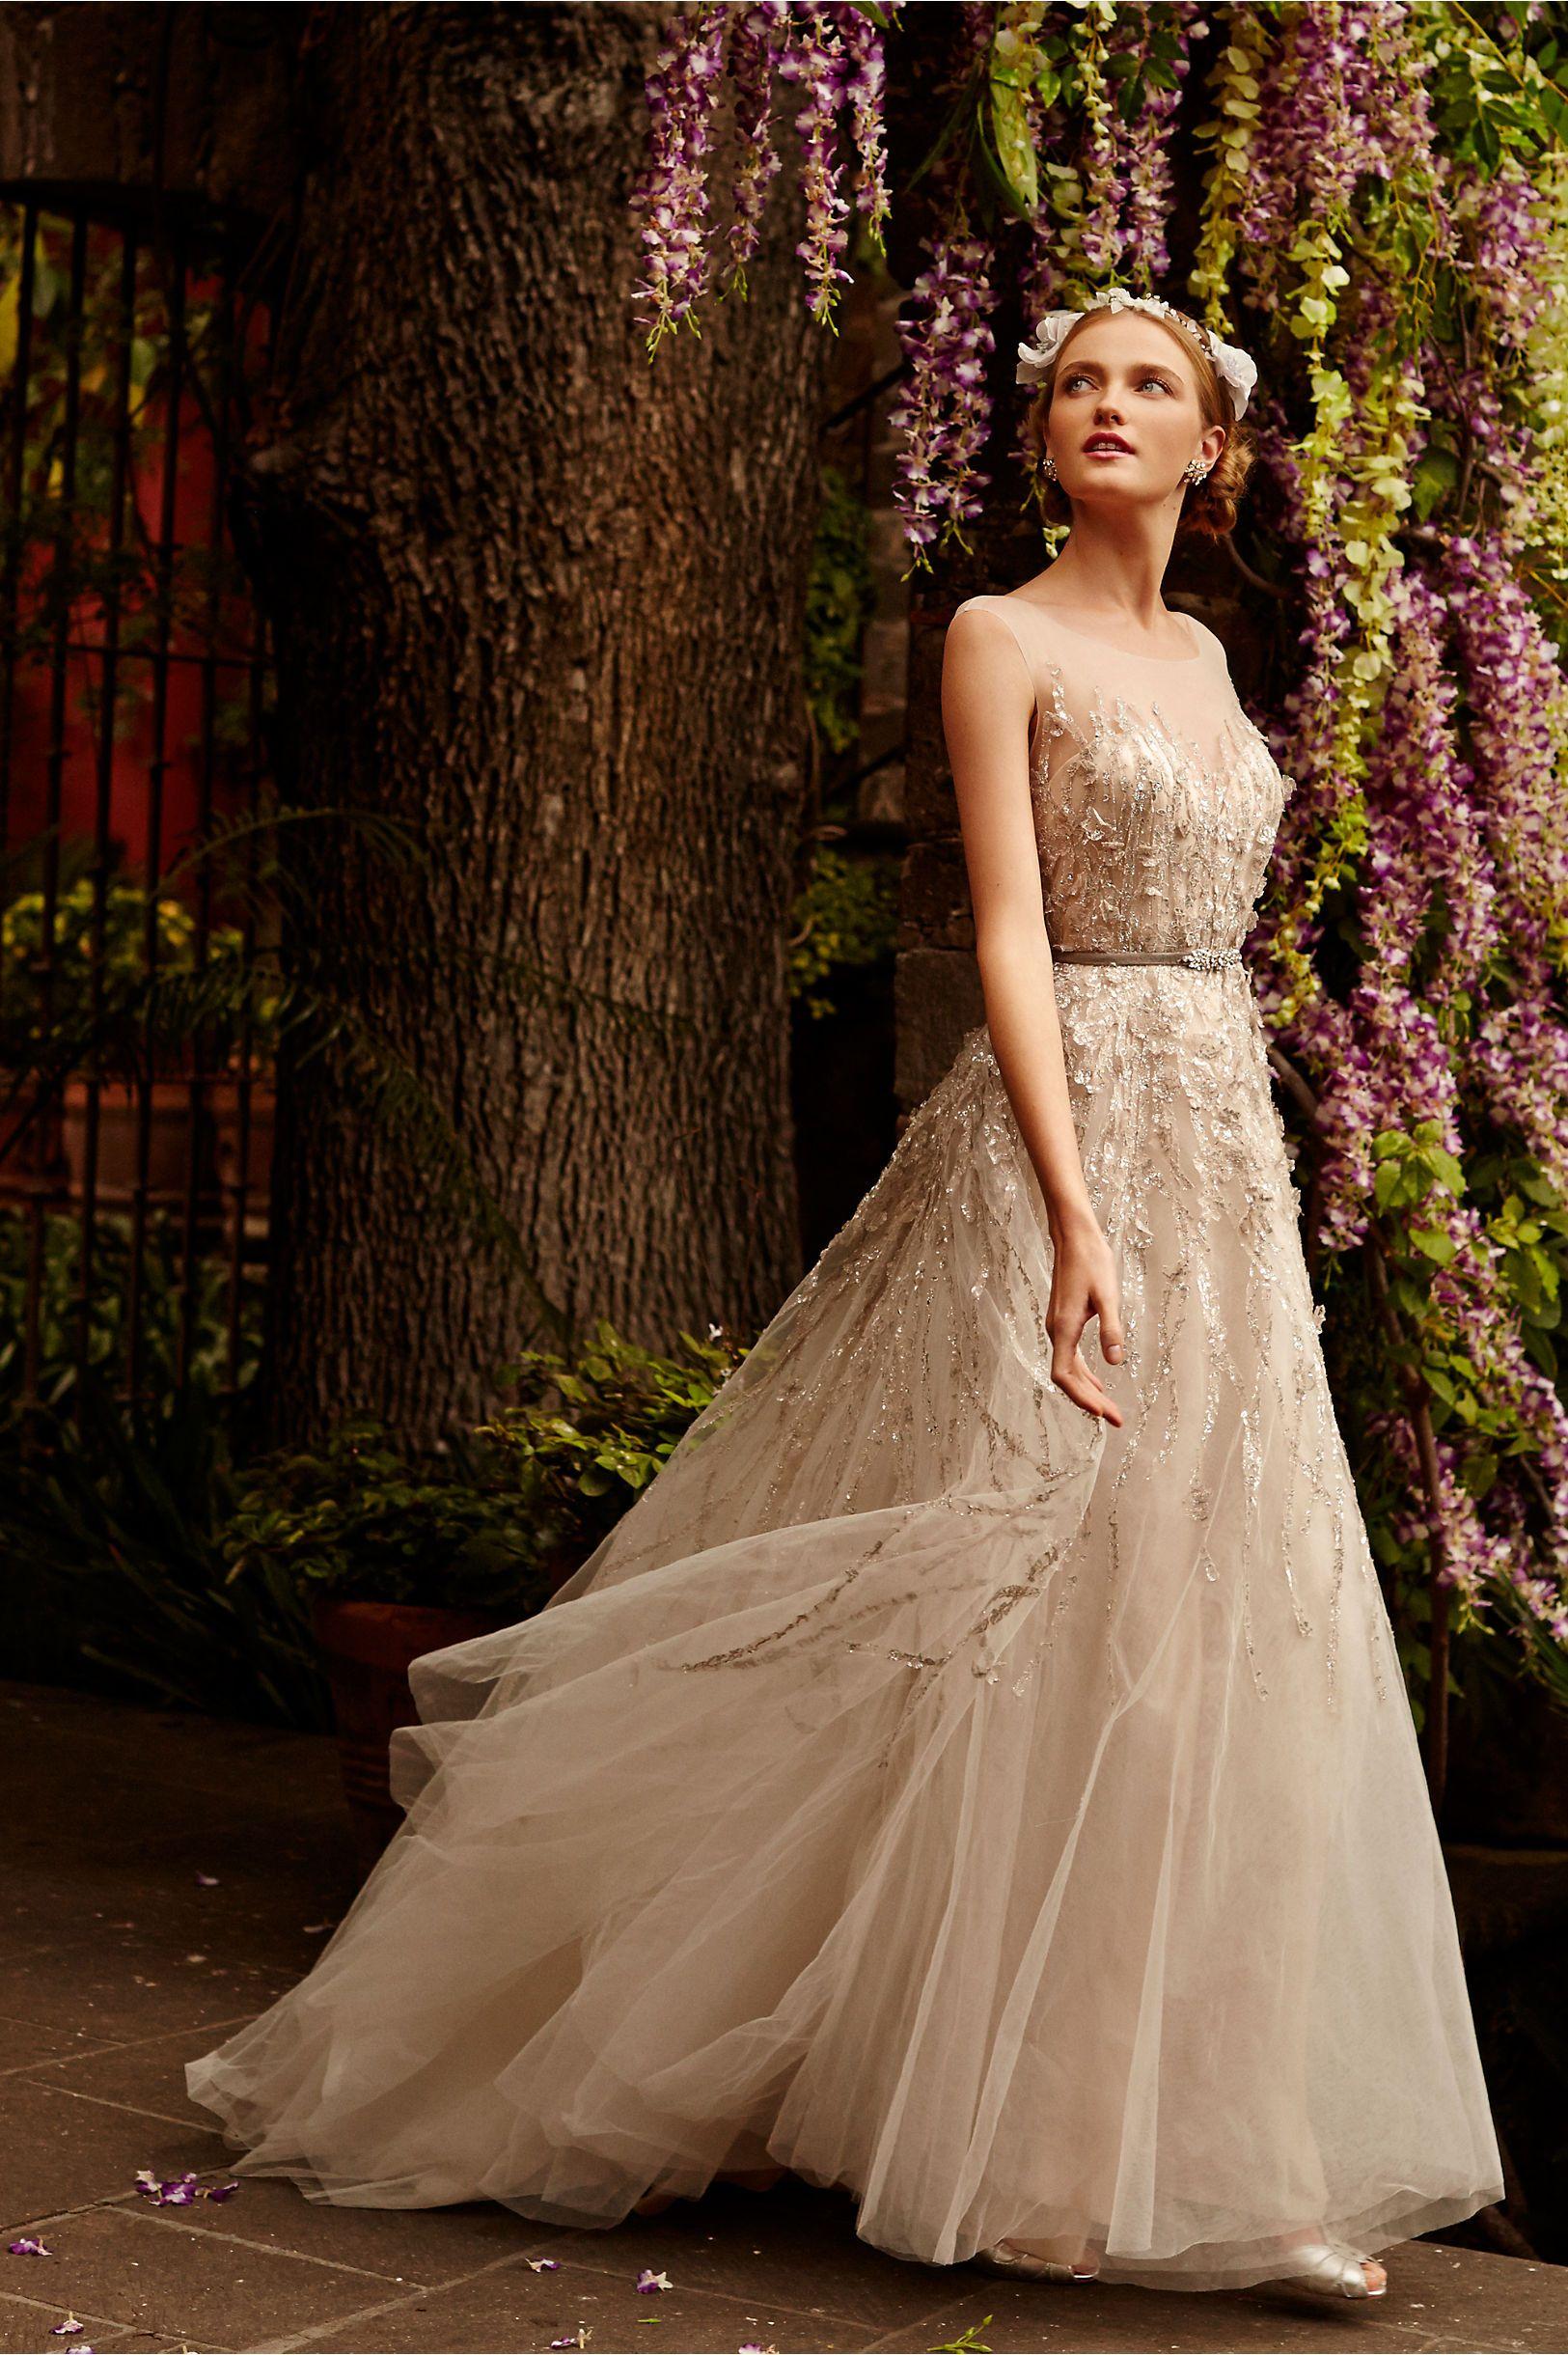 Wisteria wedding gown bhldn fashion pinterest wisteria